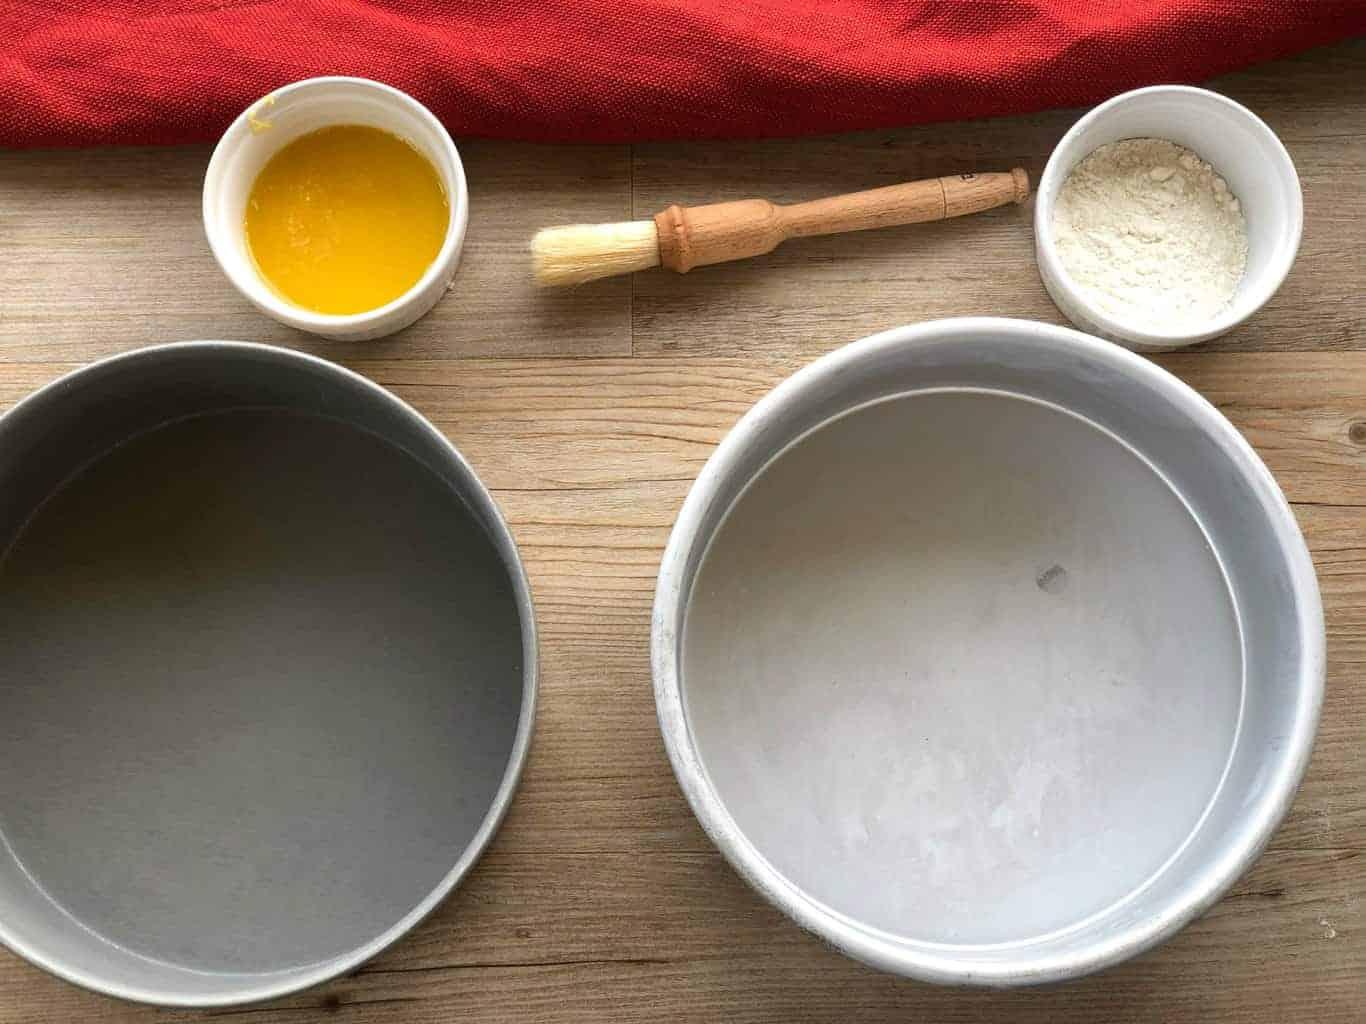 Preparing Sponge Cake Tins